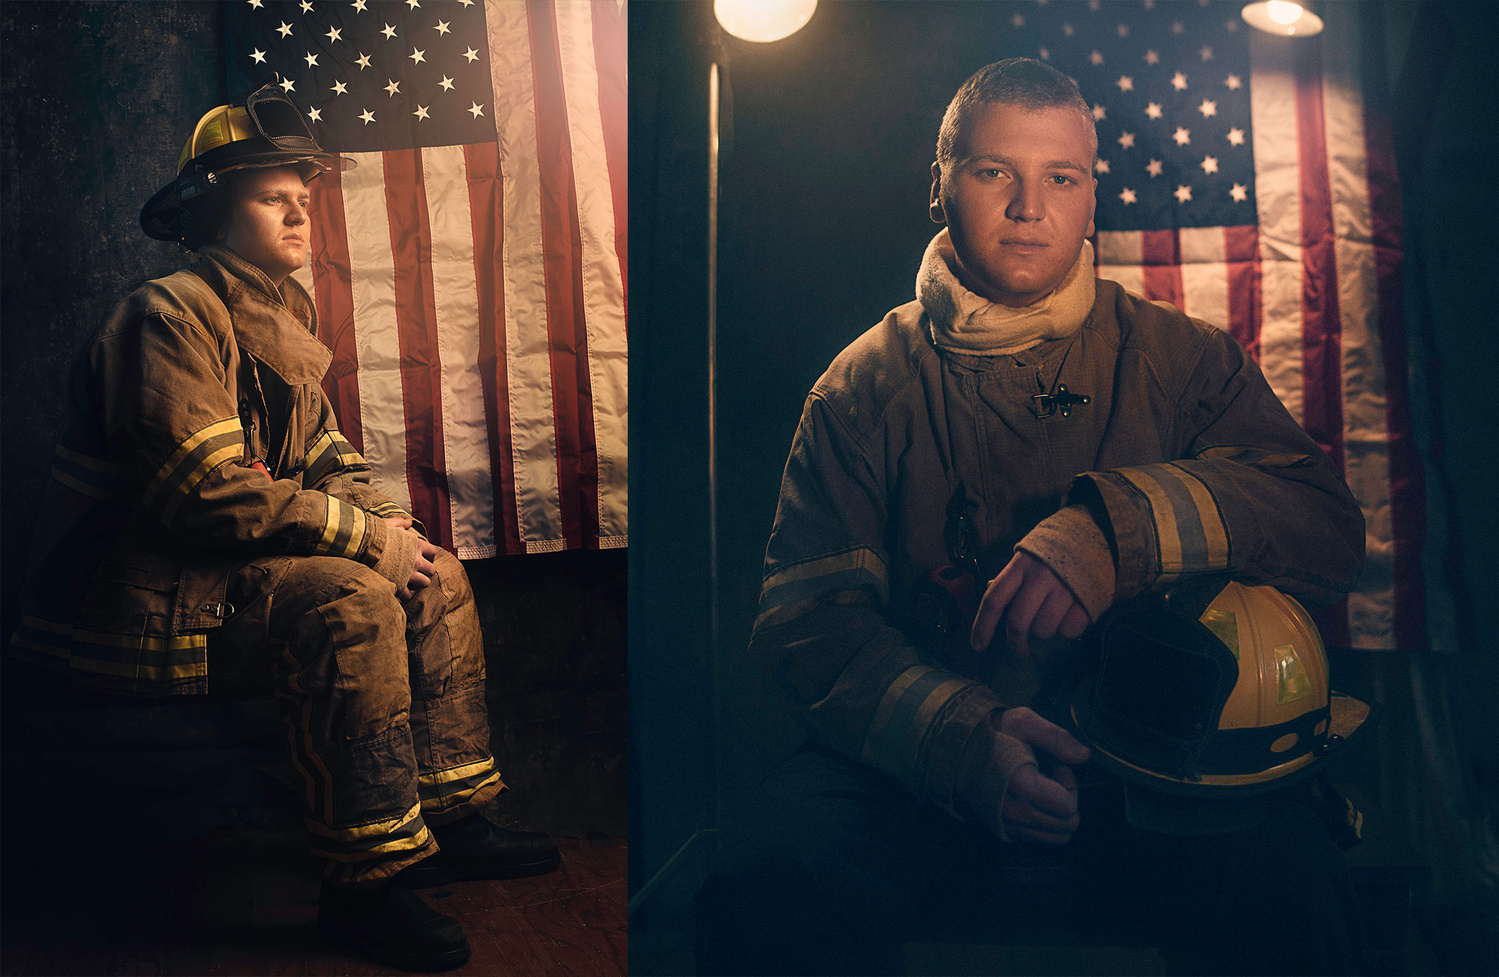 A Real Hero by Eli Dreyfuss